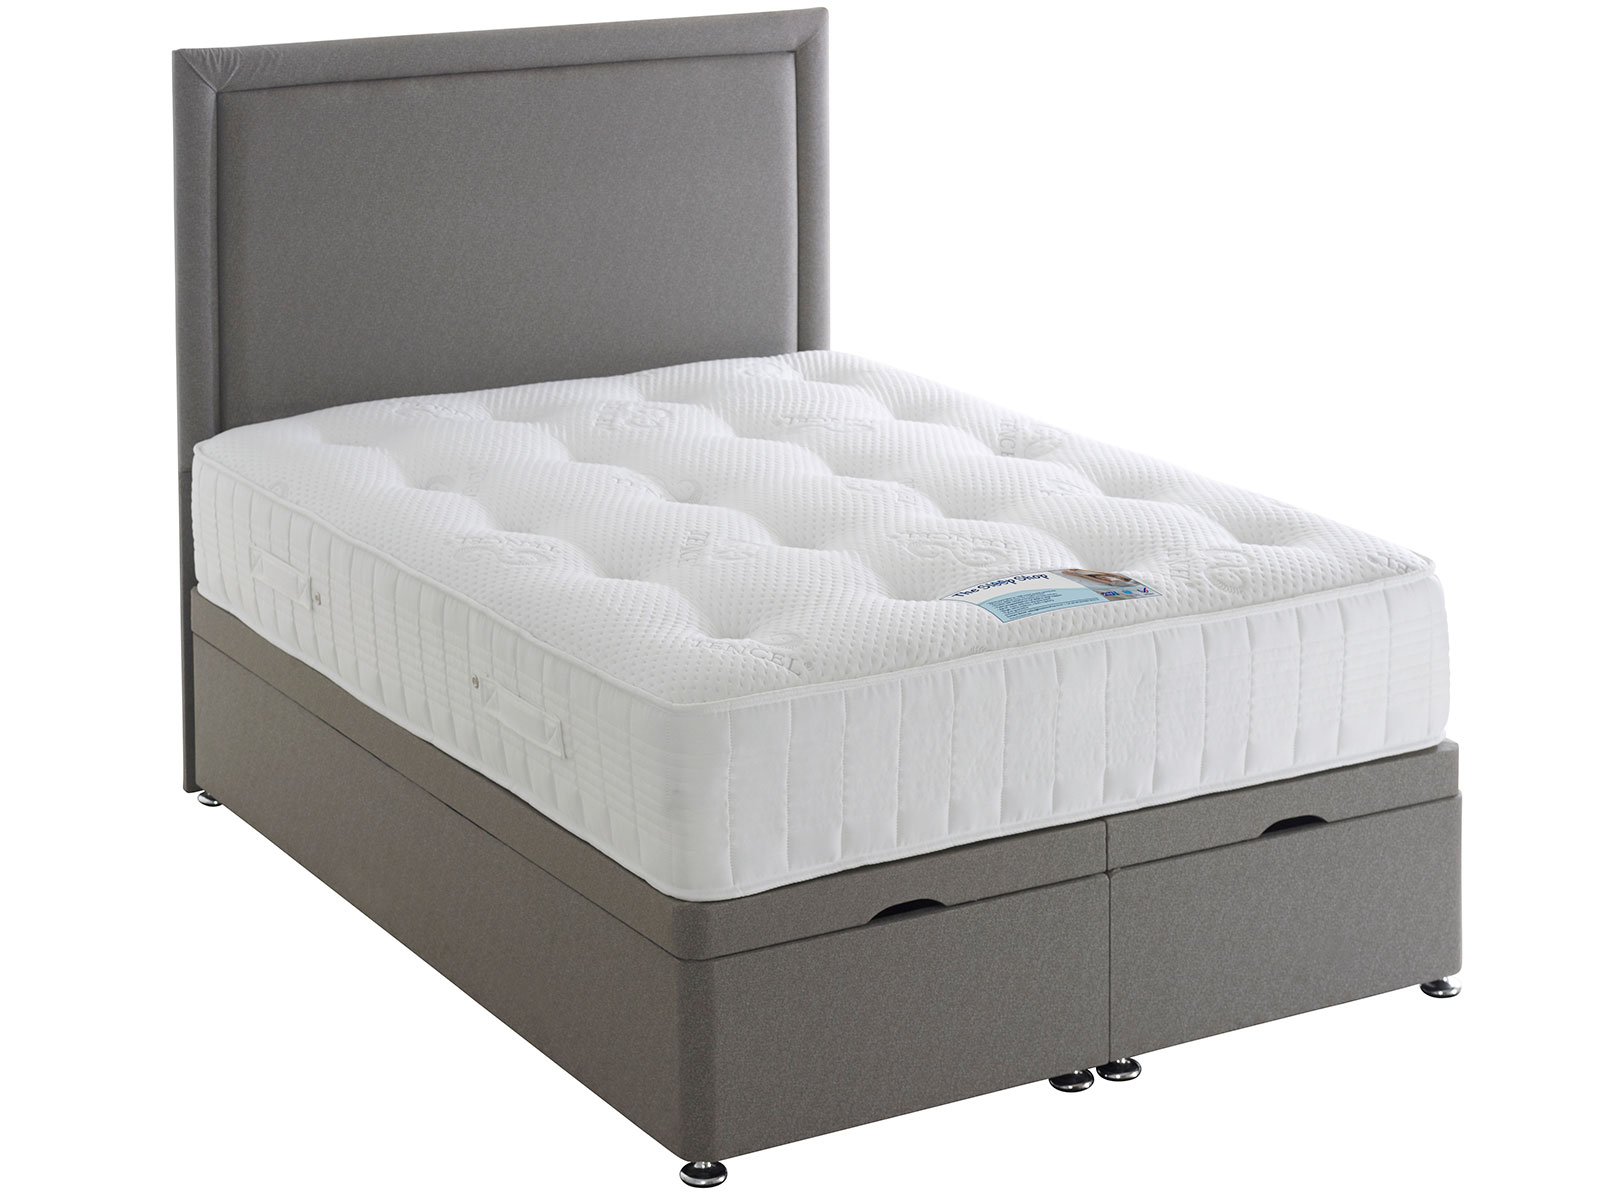 4ft Small Double Sleep Shop Tencel 1000 Supreme Mattress